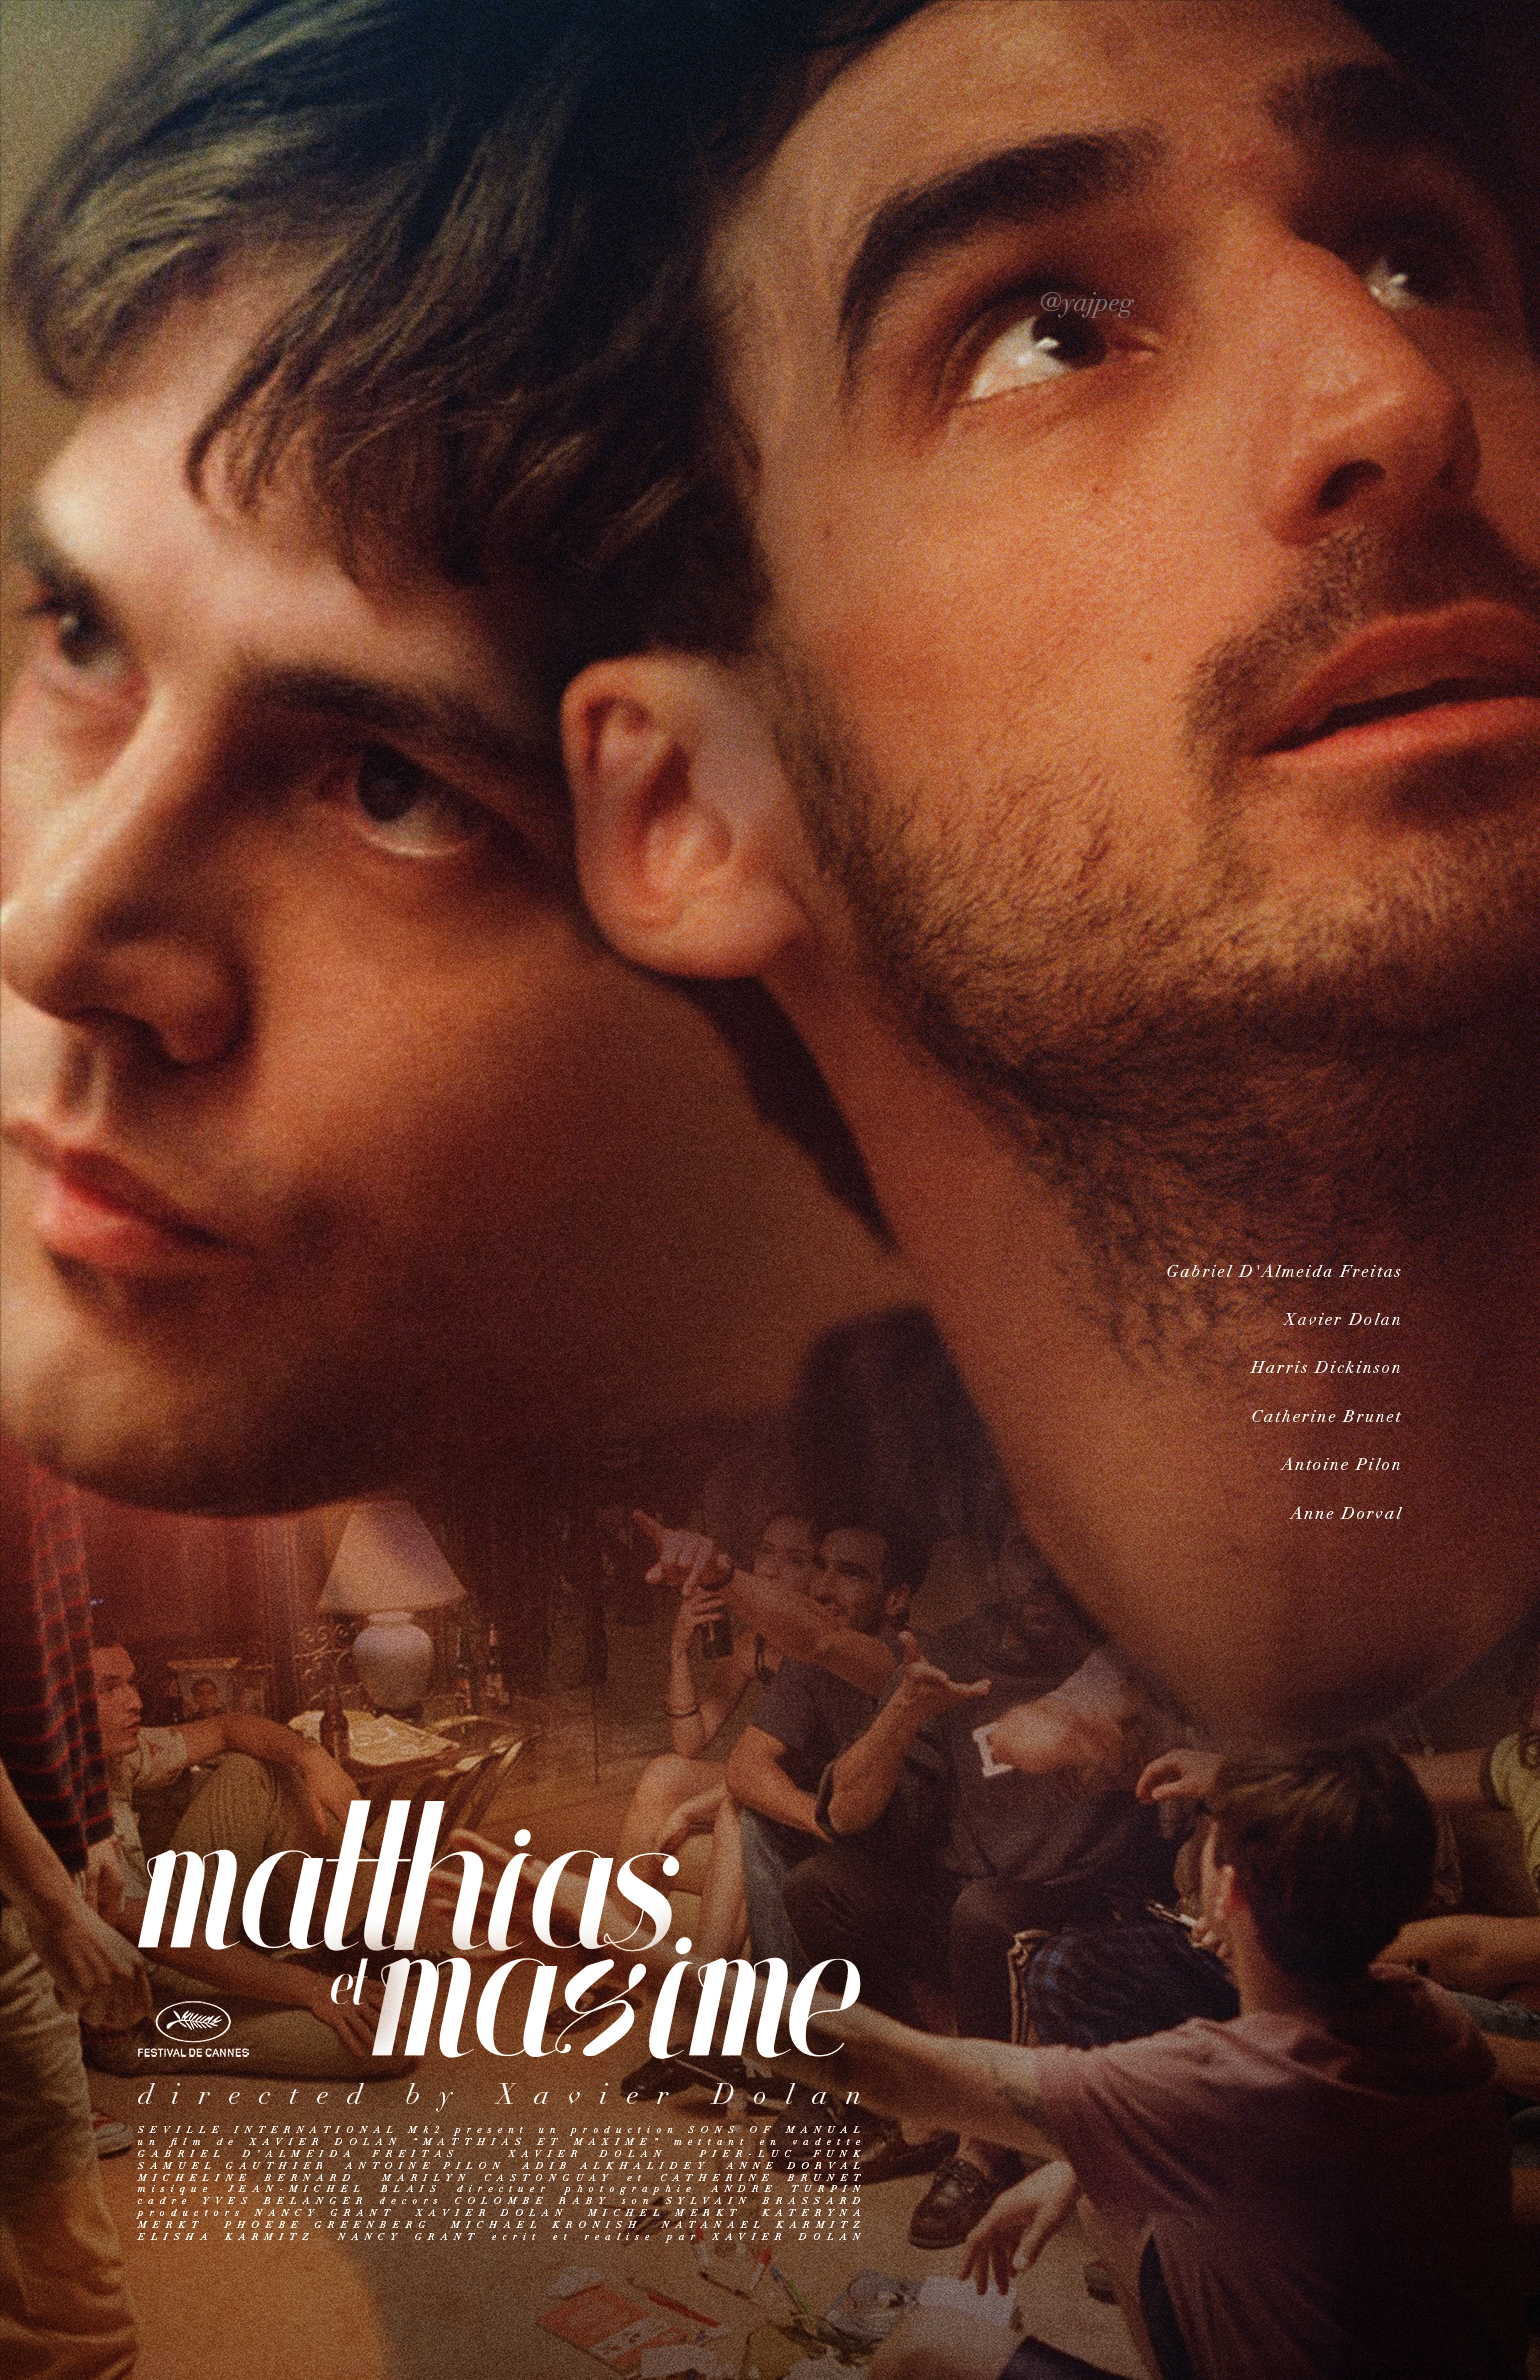 Matthias Et Maxime Credits.png